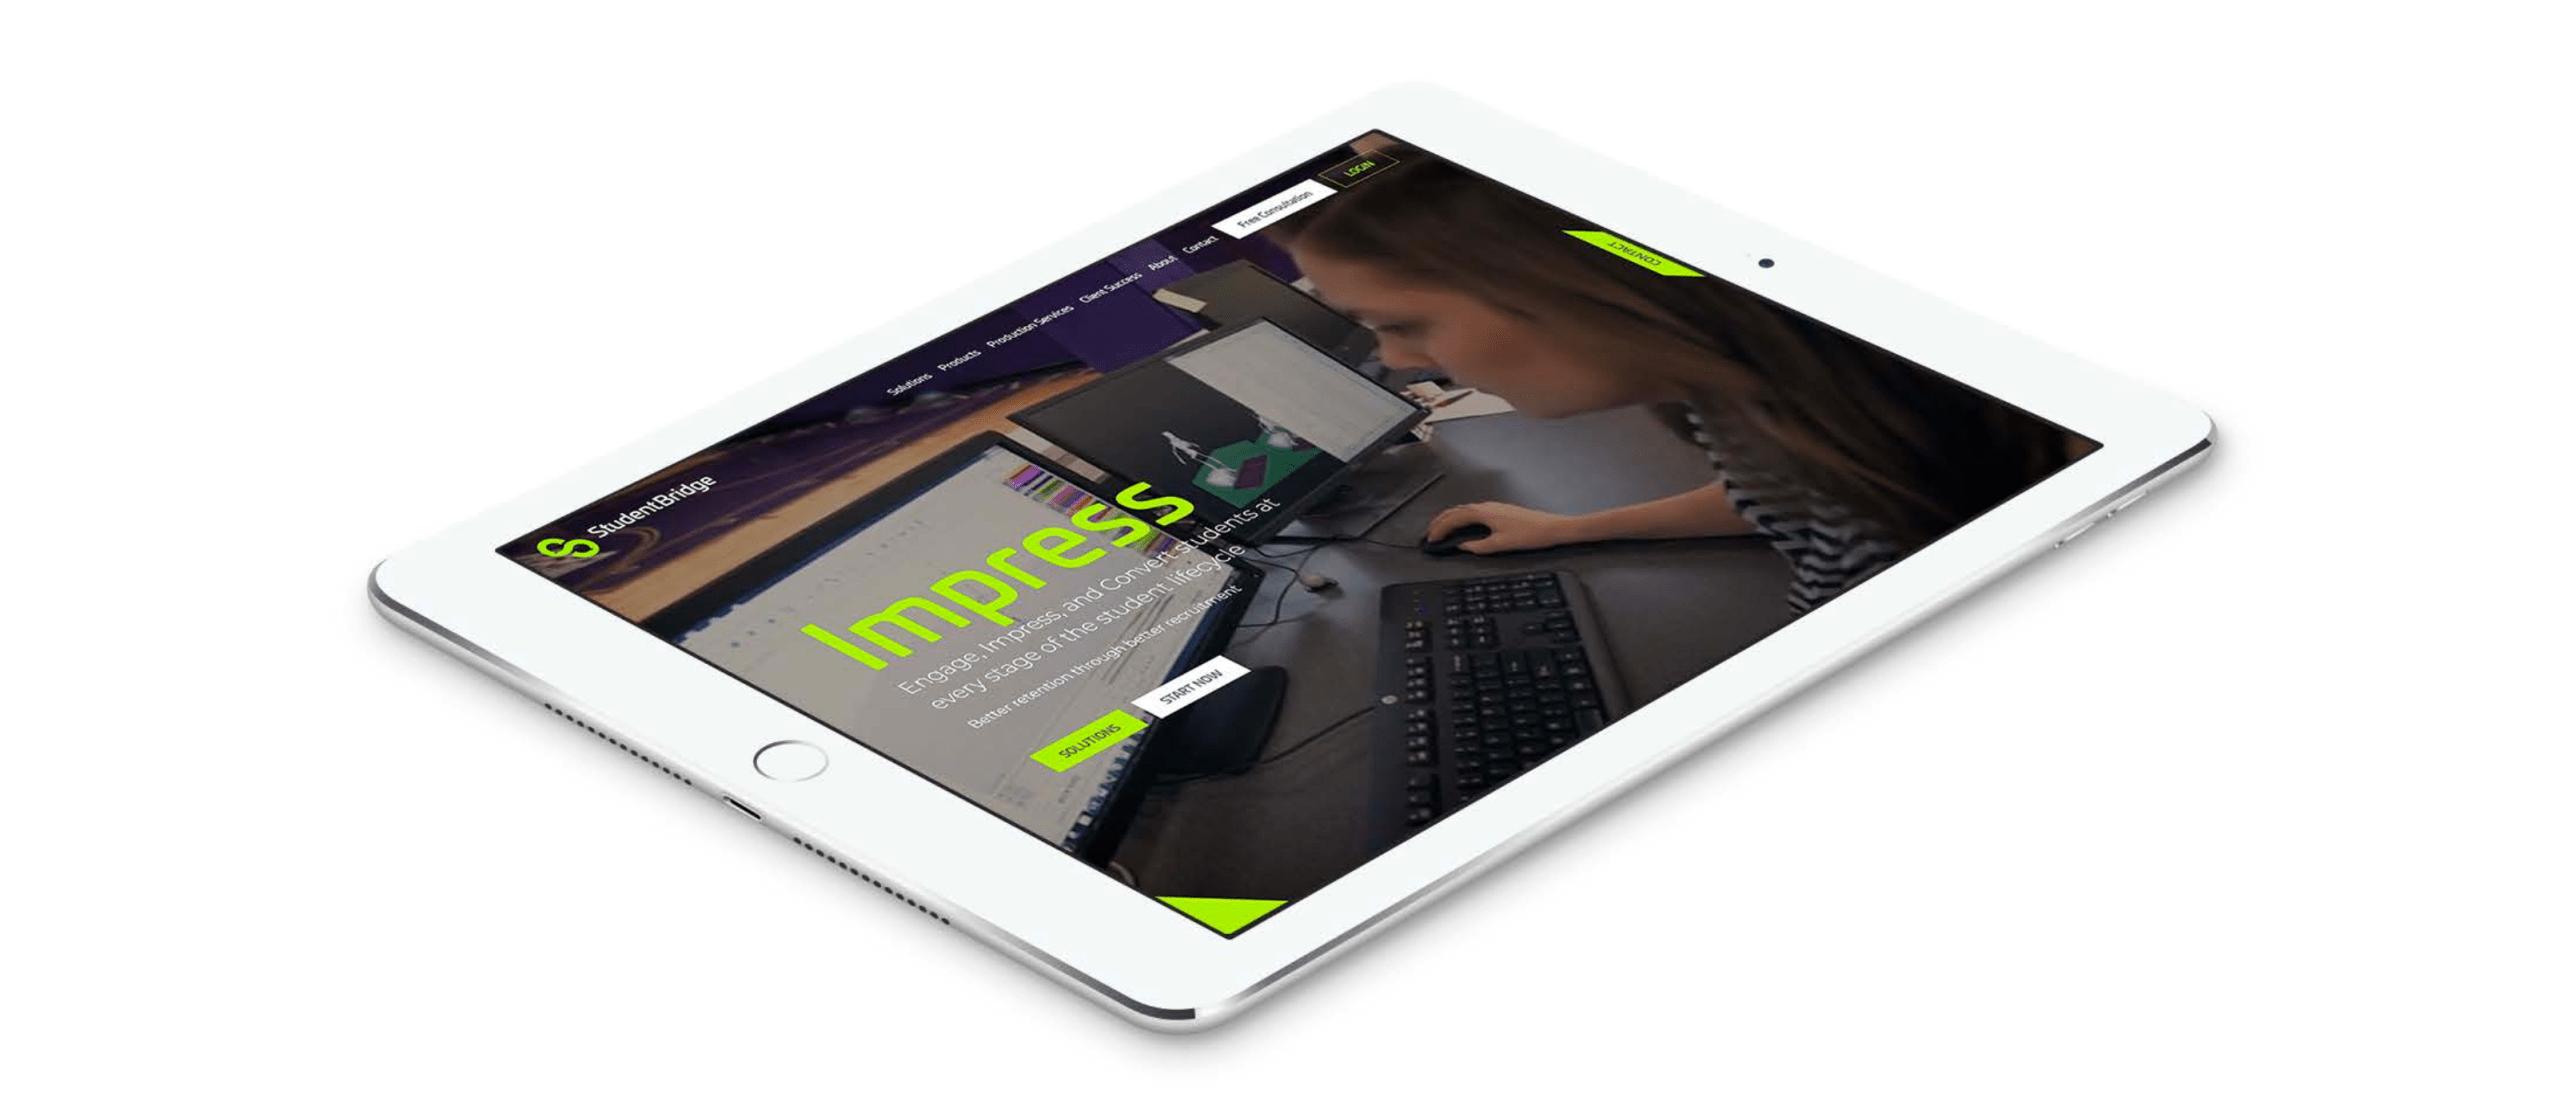 Student Bridge website displayed on mobile tablet.